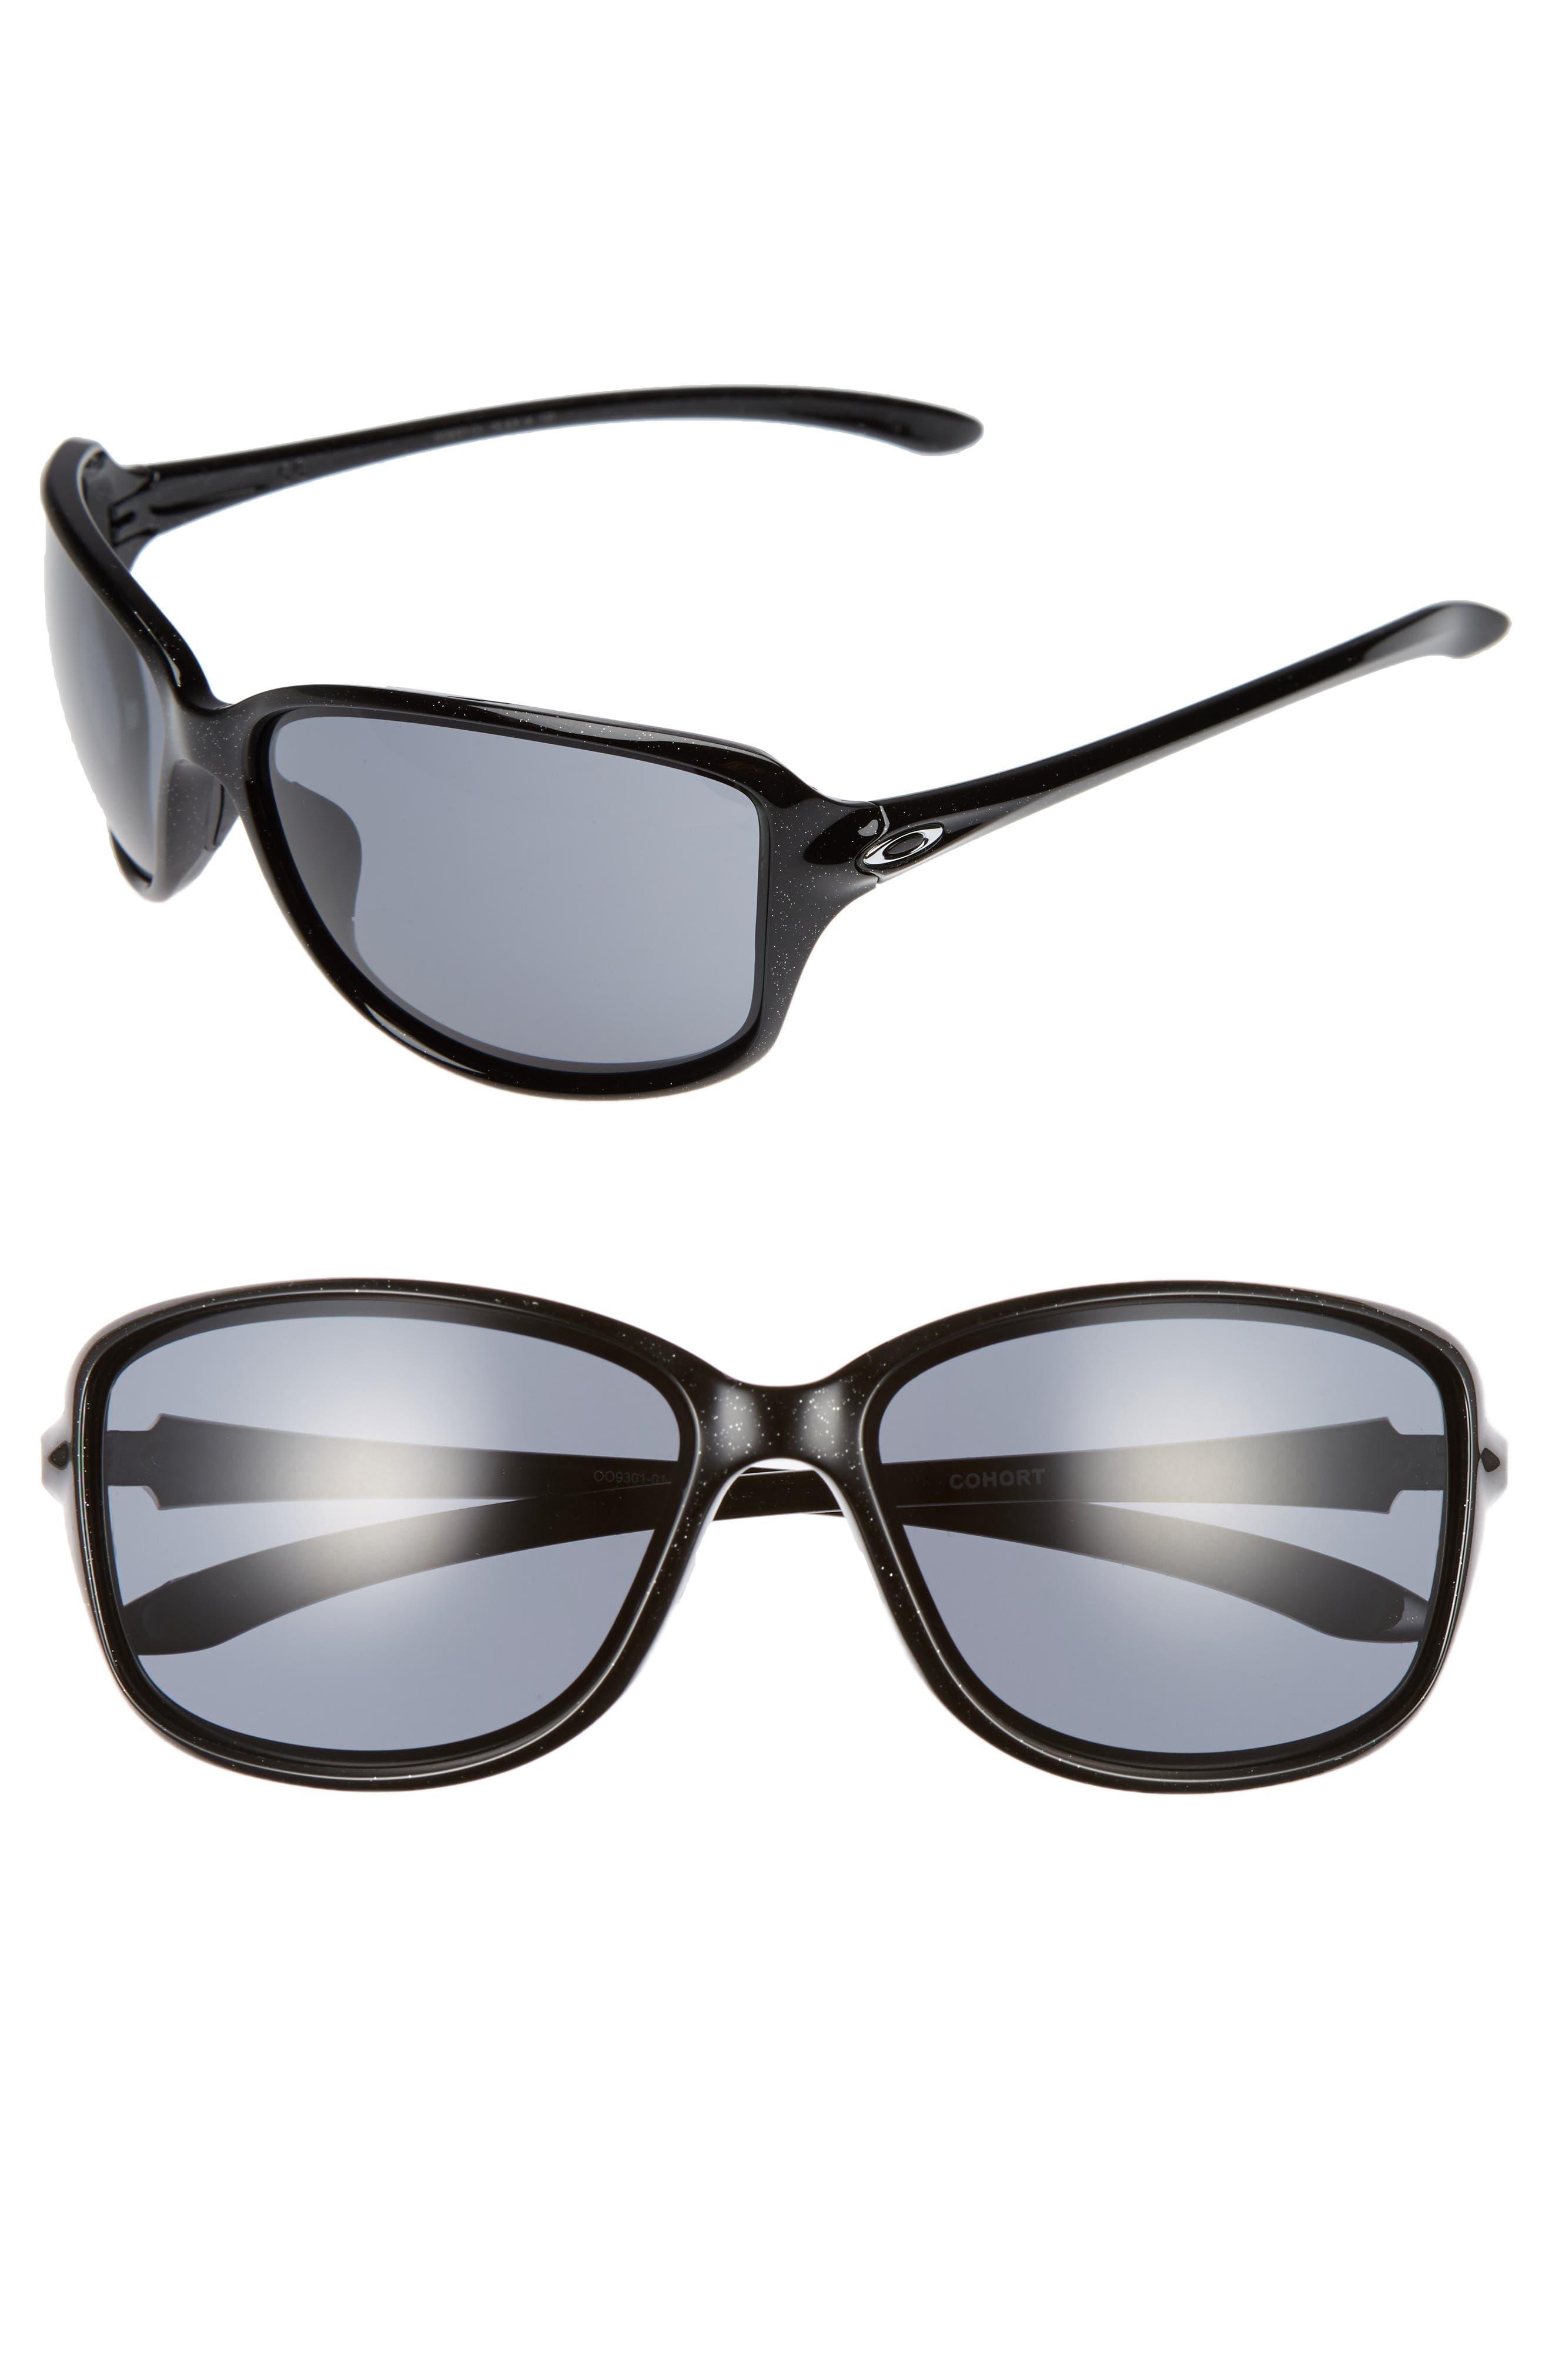 Cohort 62mm Sunglasses,                             Main thumbnail 1, color,